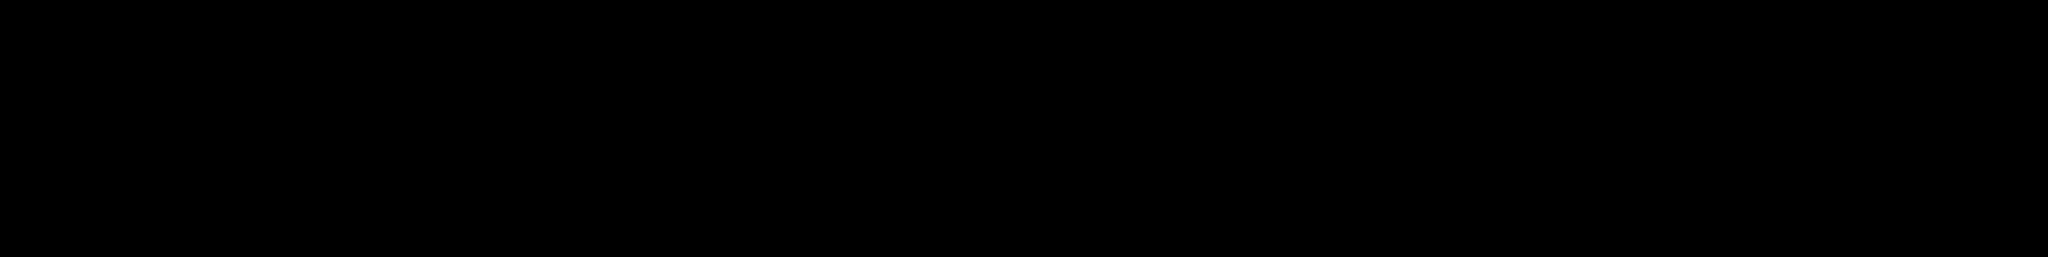 logos_row